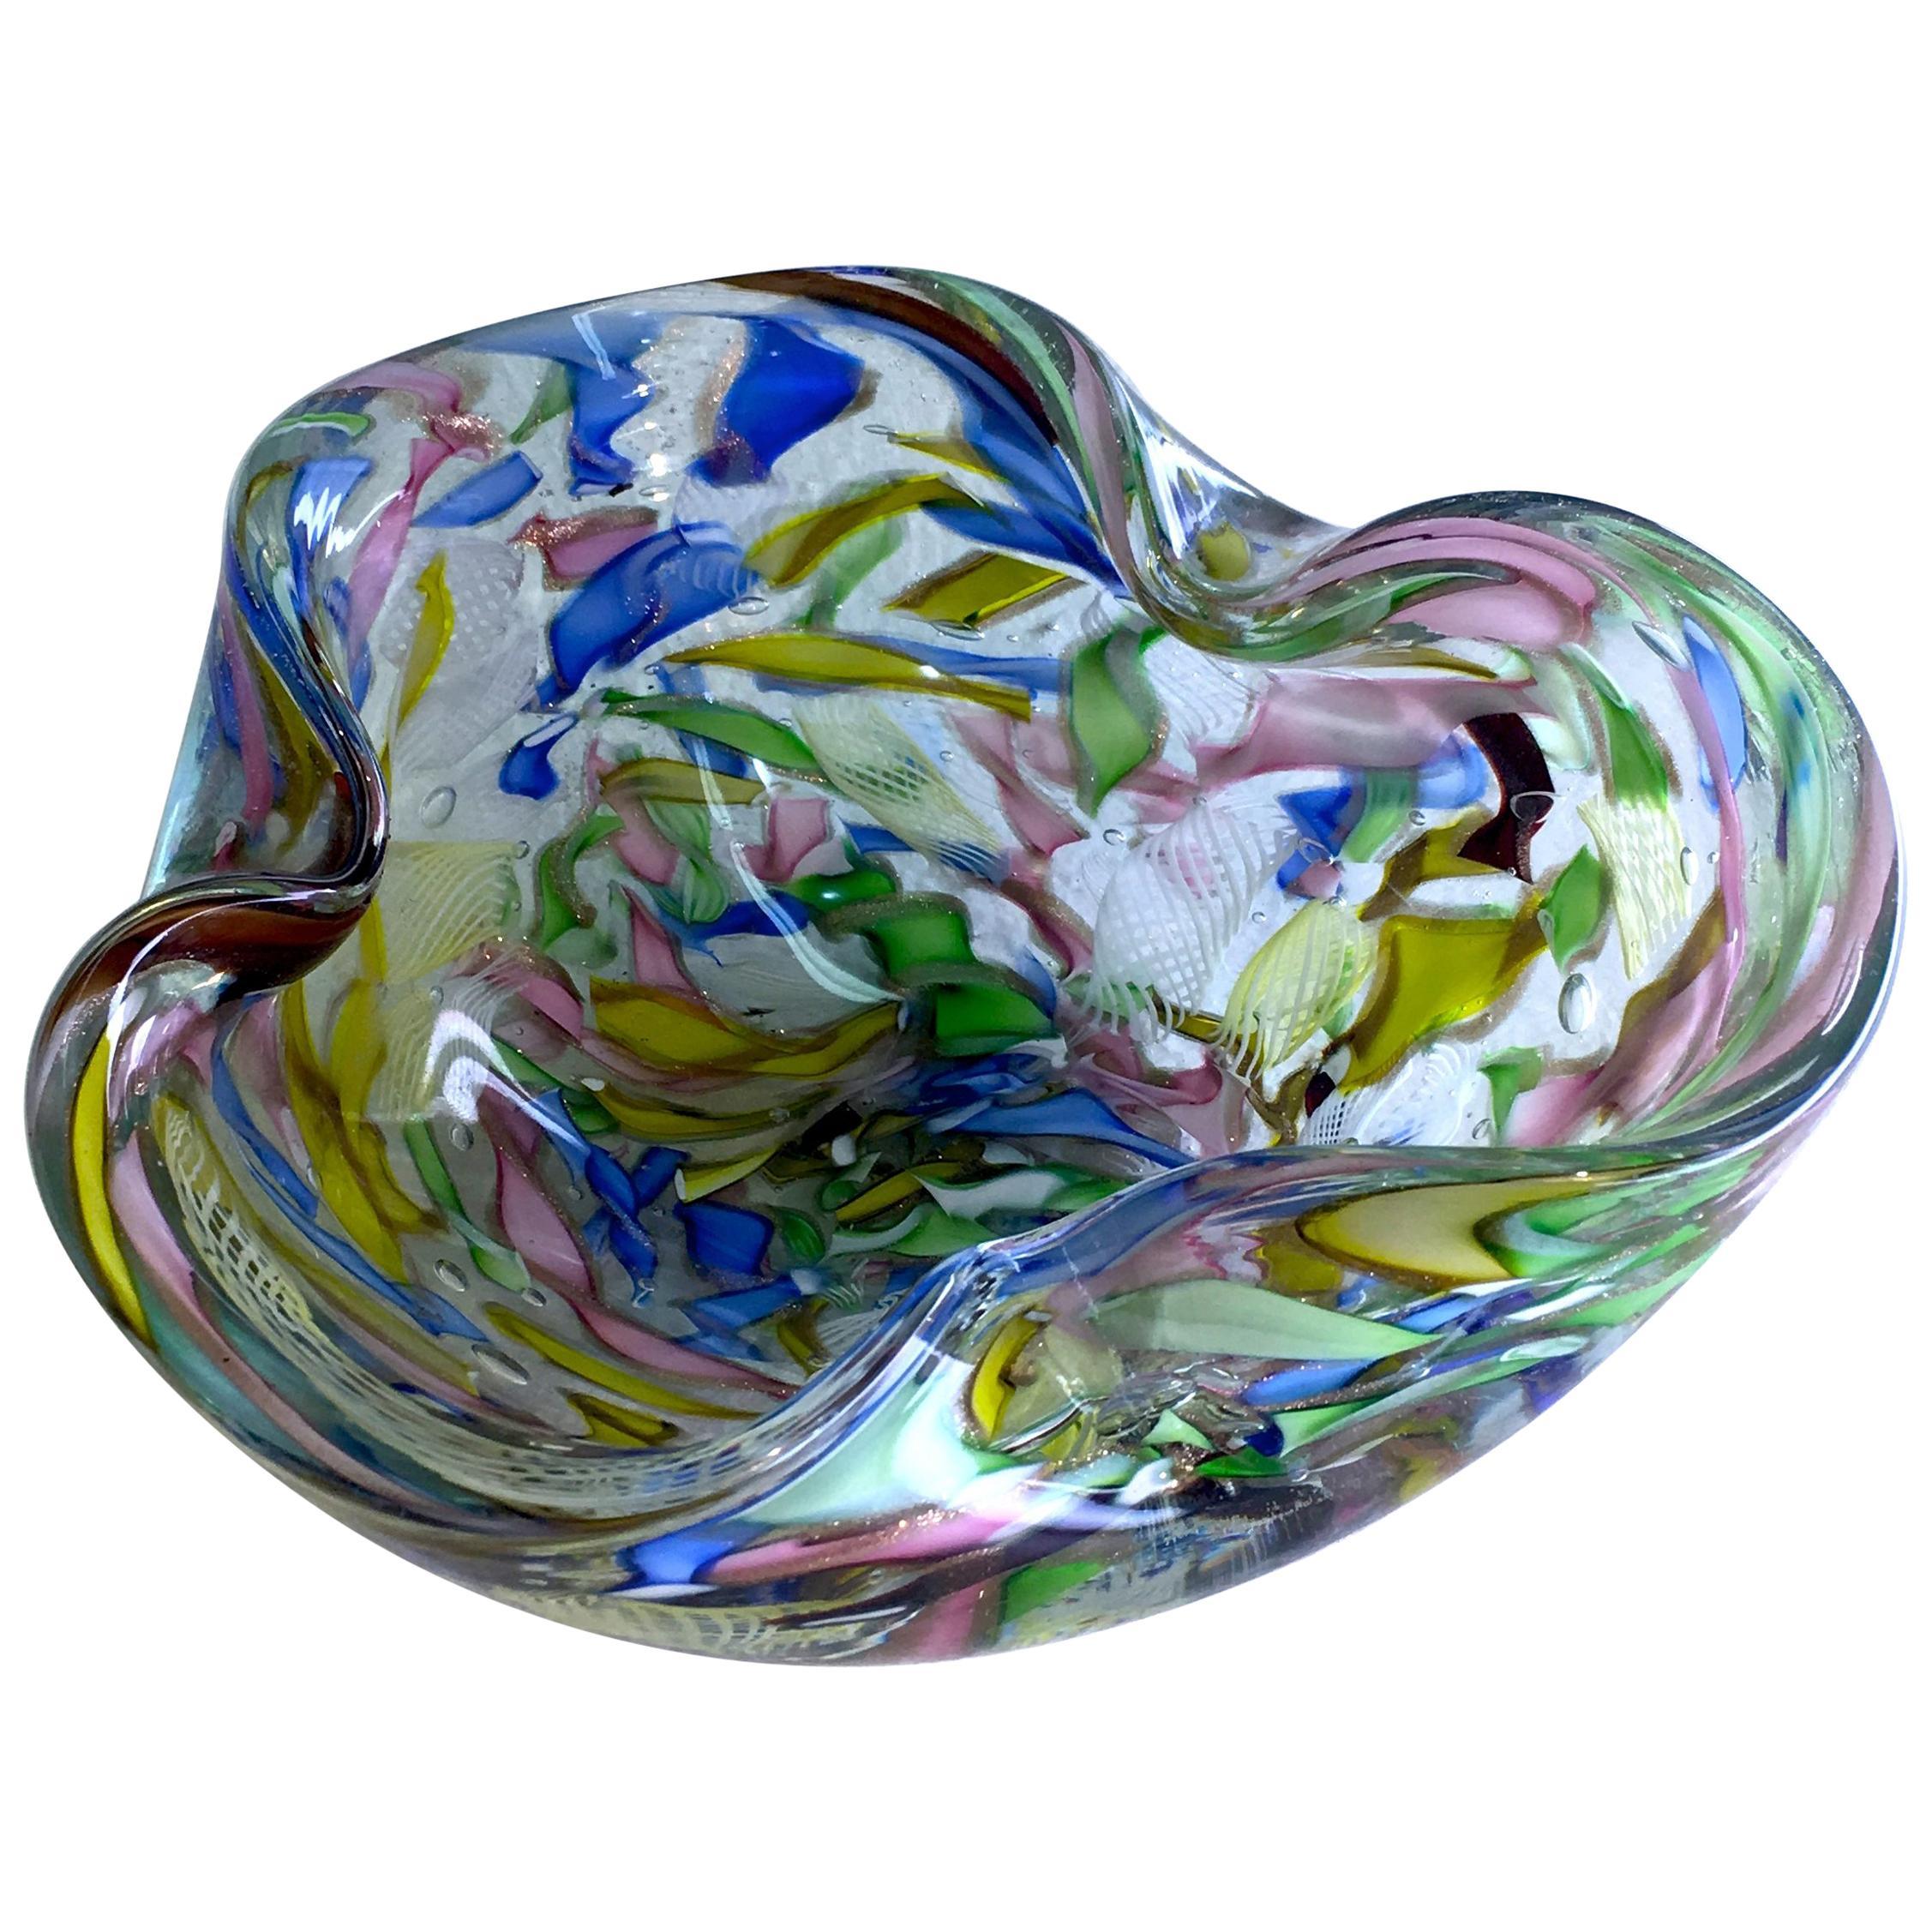 Signed Decorative Folded Art Glass Bowl by AVeM Italy, 1950